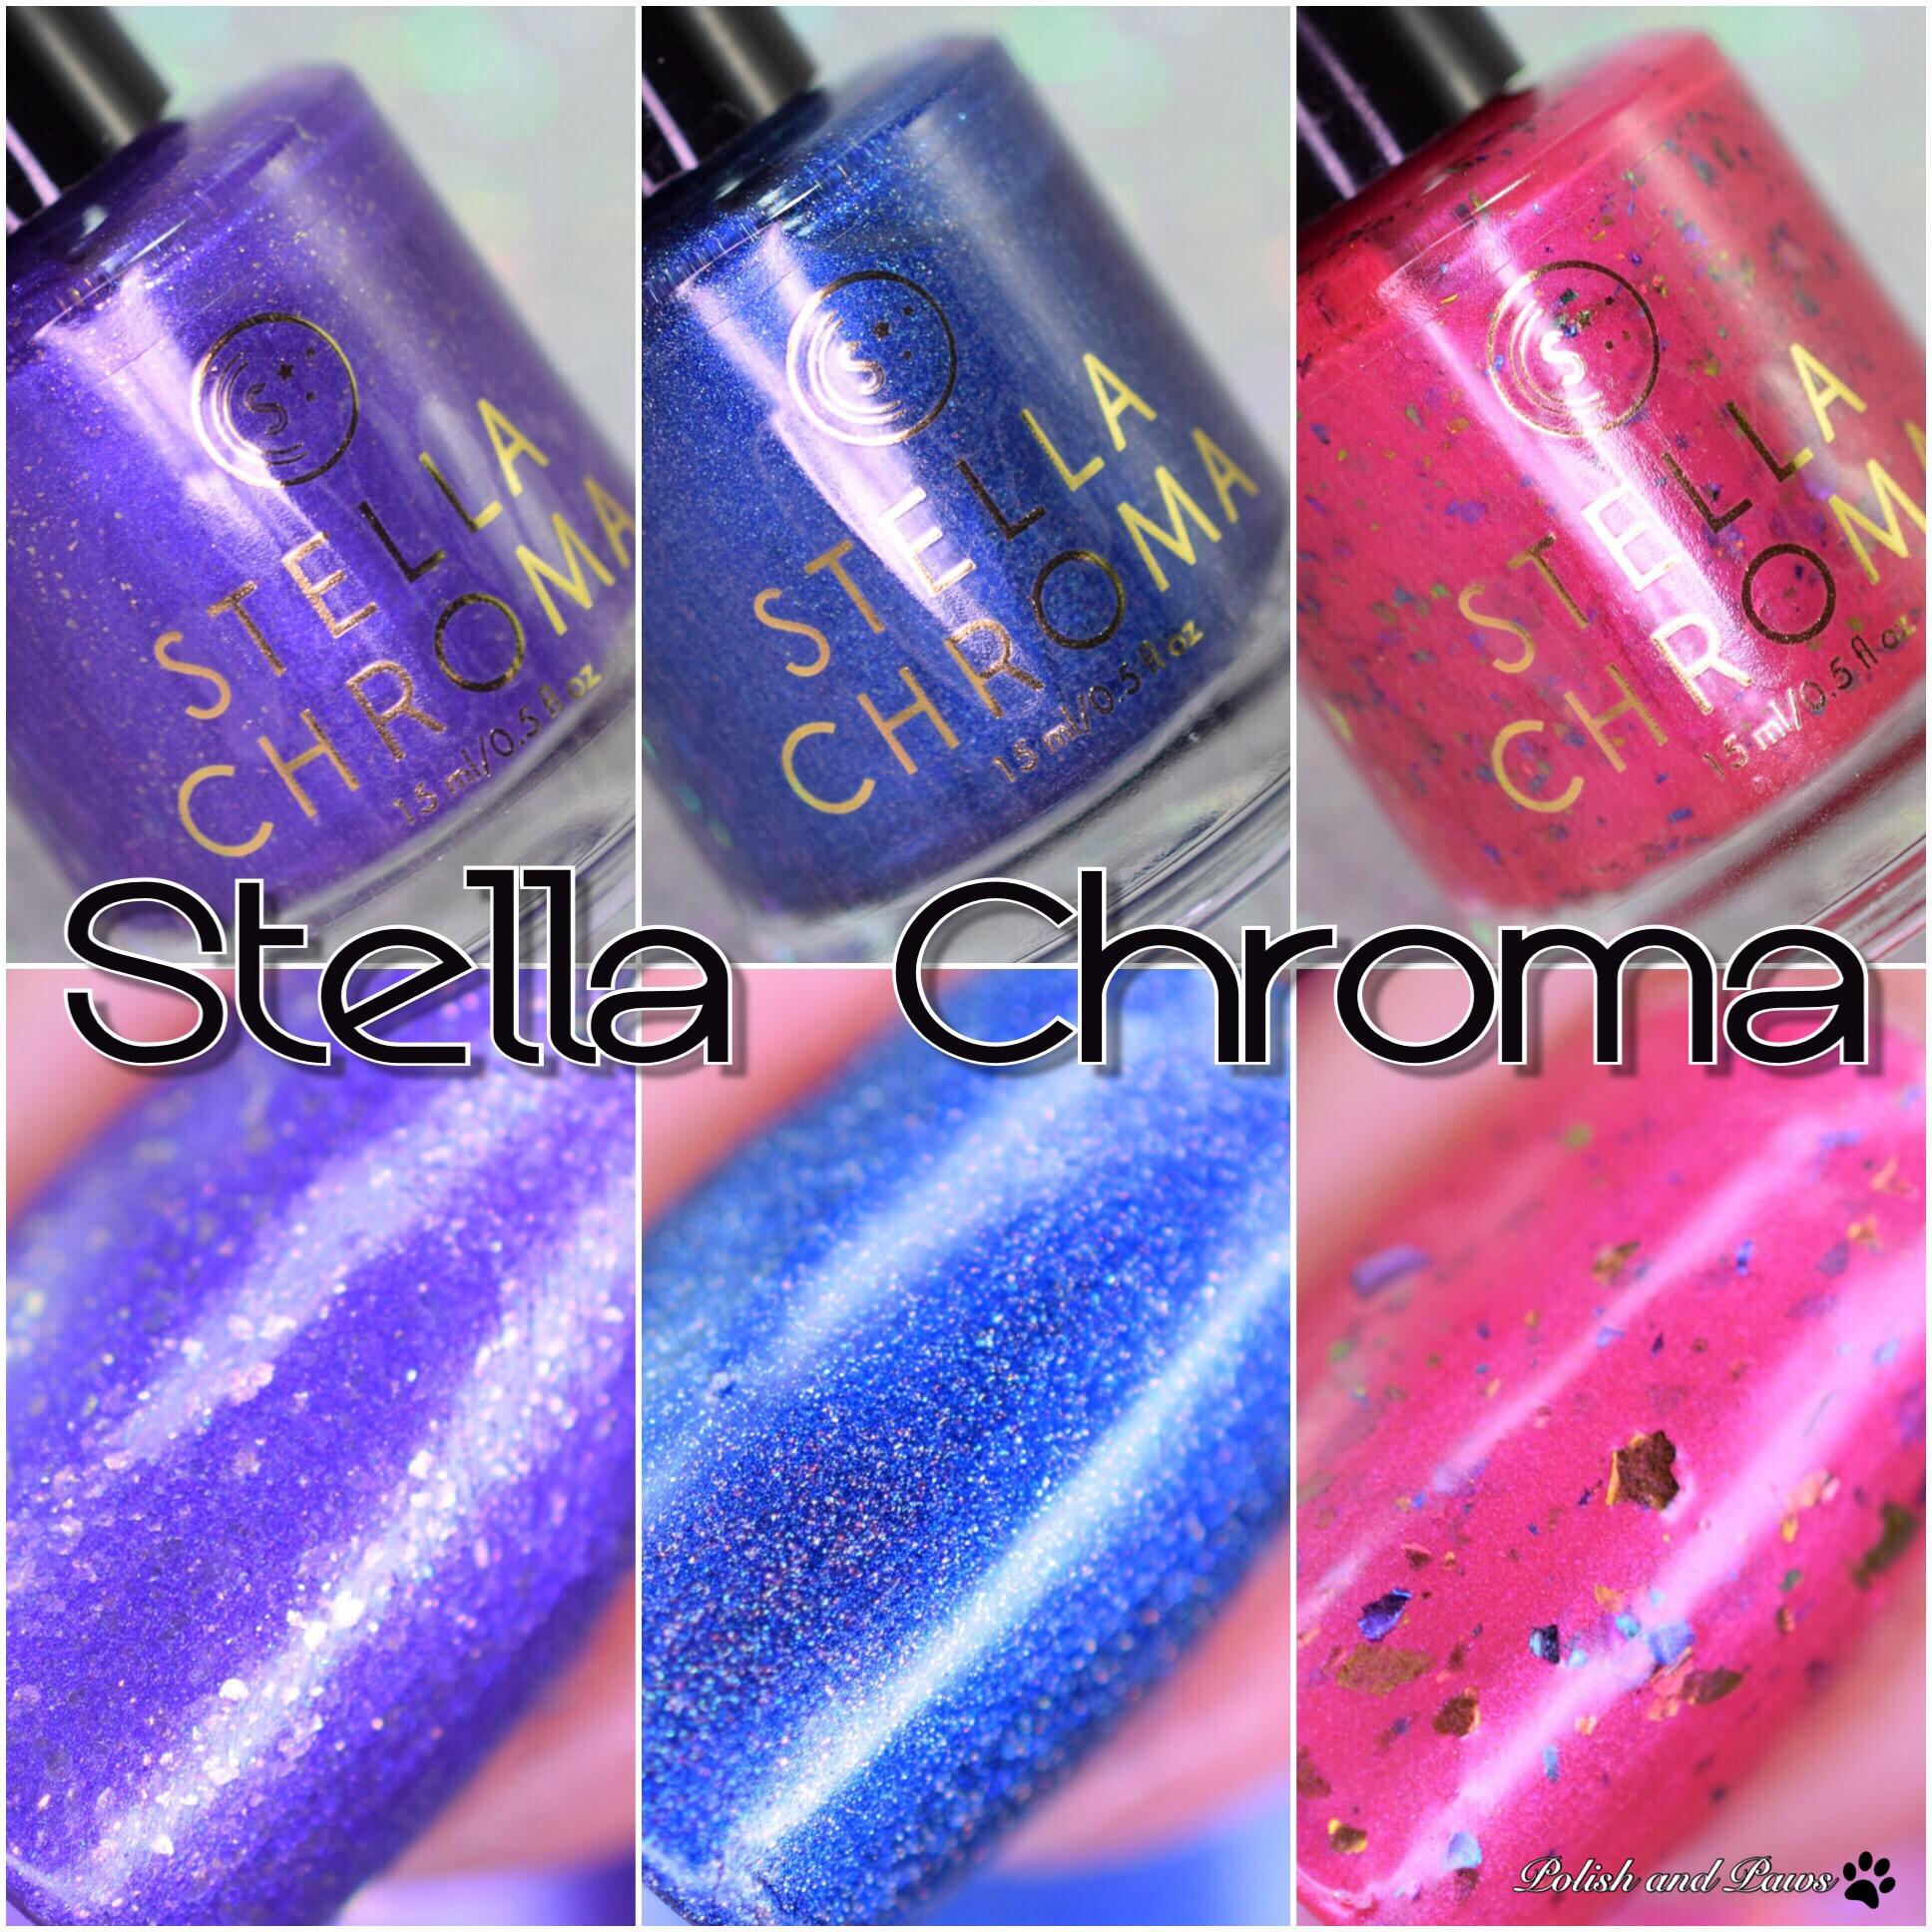 Stella Chroma